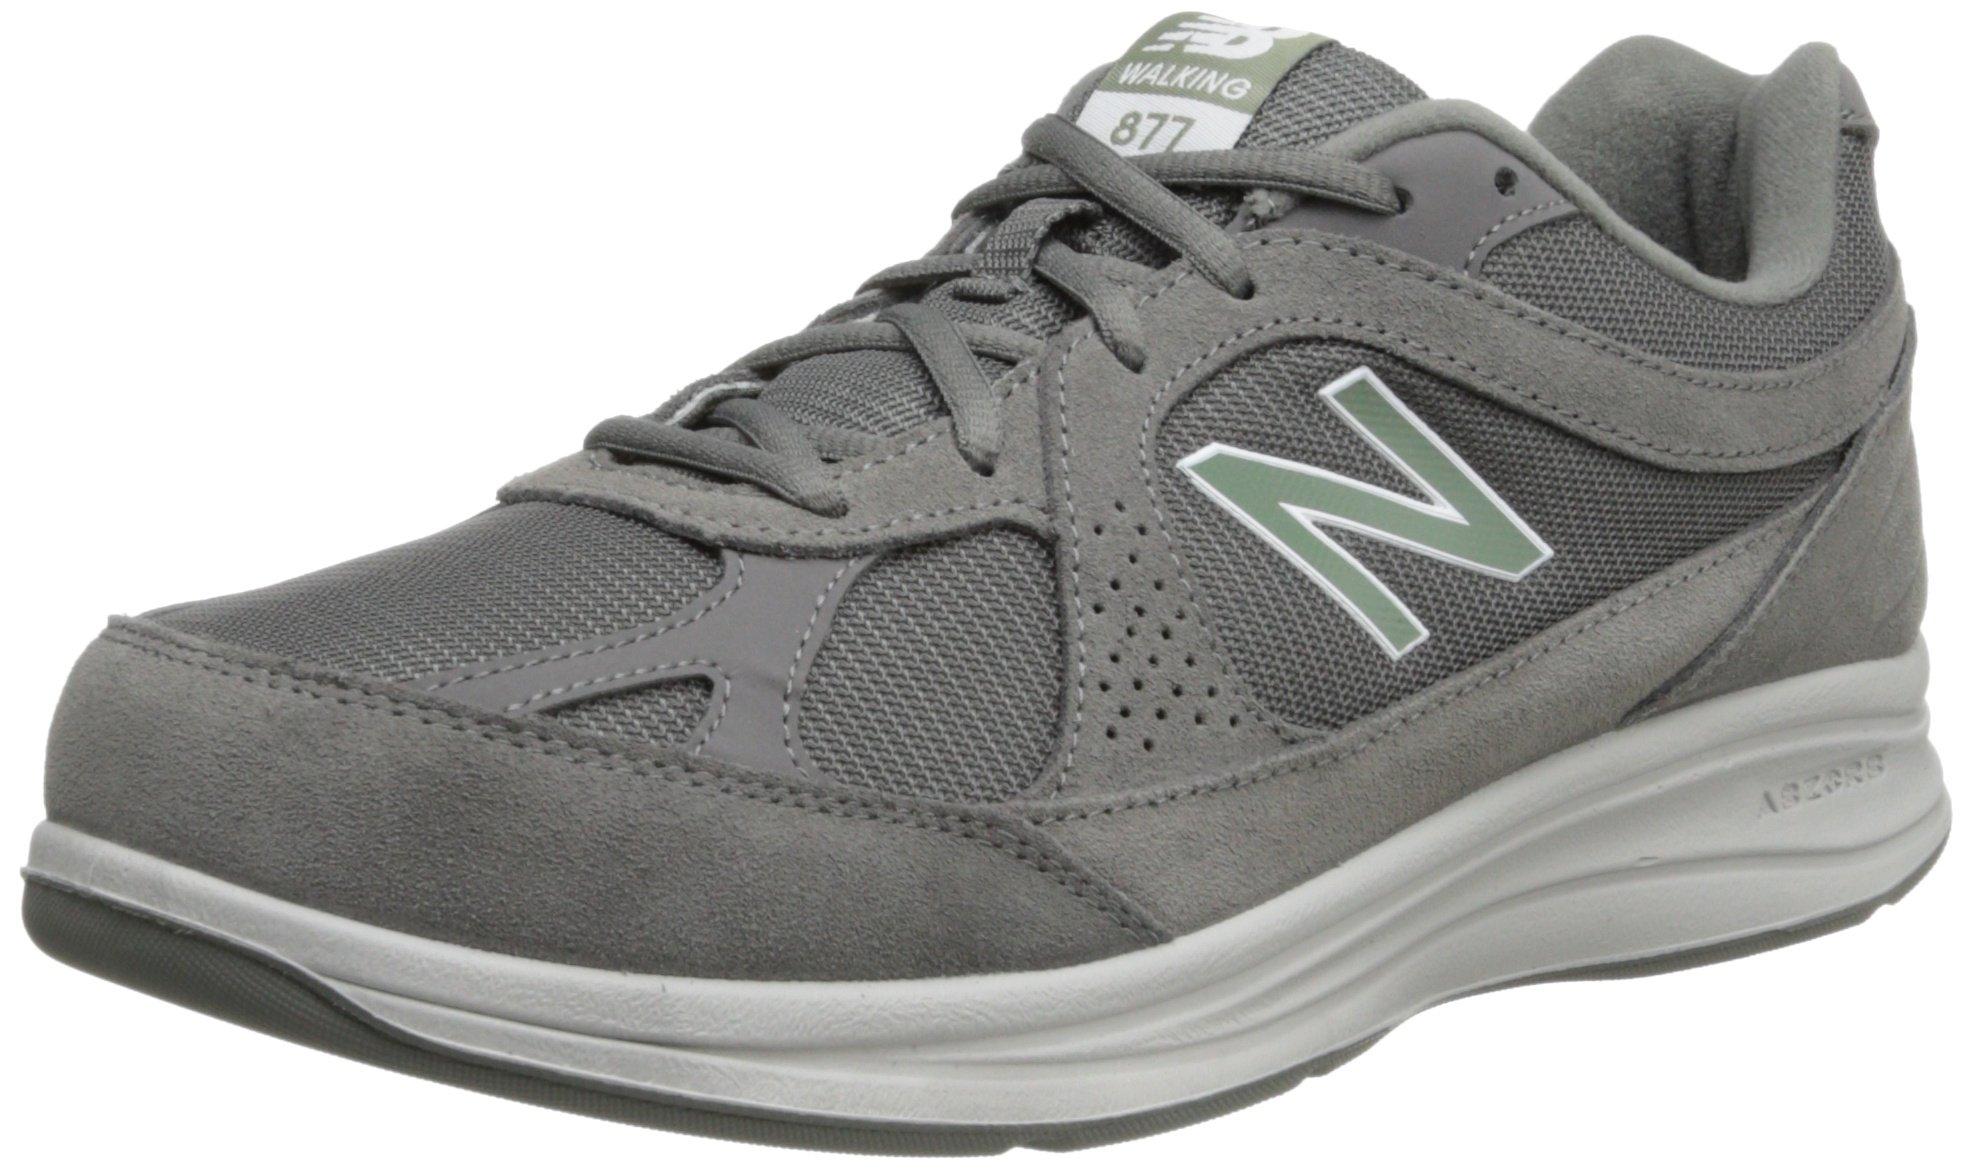 New Balance Men's MW877 Walking Shoe,  Grey, 11 W US by New Balance